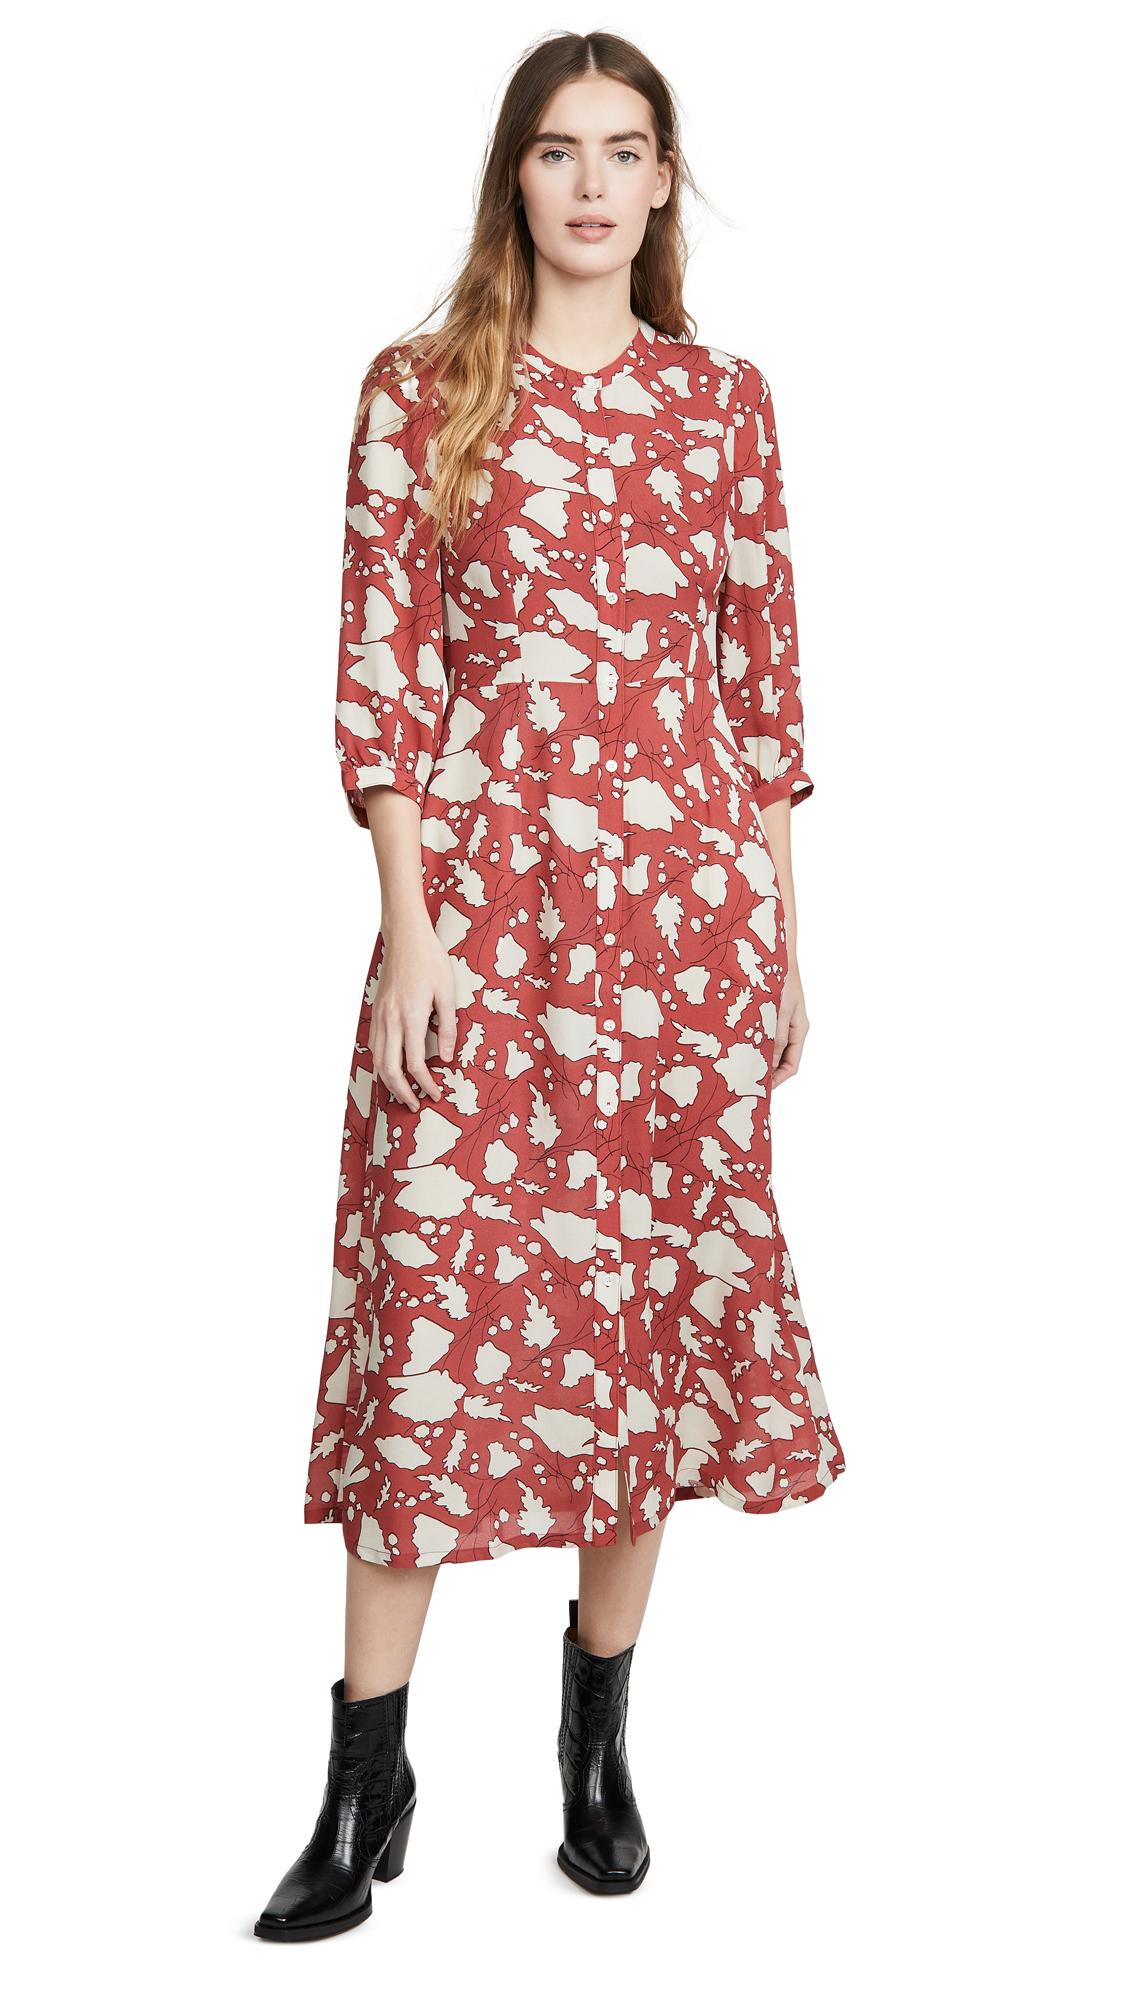 Buy Raquel Allegra Ruffle Dreamer Dress online beautiful Raquel Allegra Clothing, Dresses